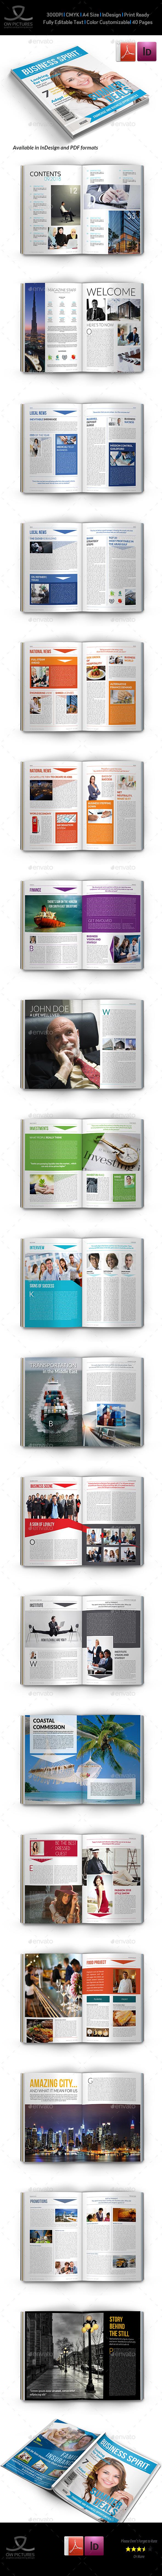 Business Spirit Newsletter Magazine - 40 Pages V.3